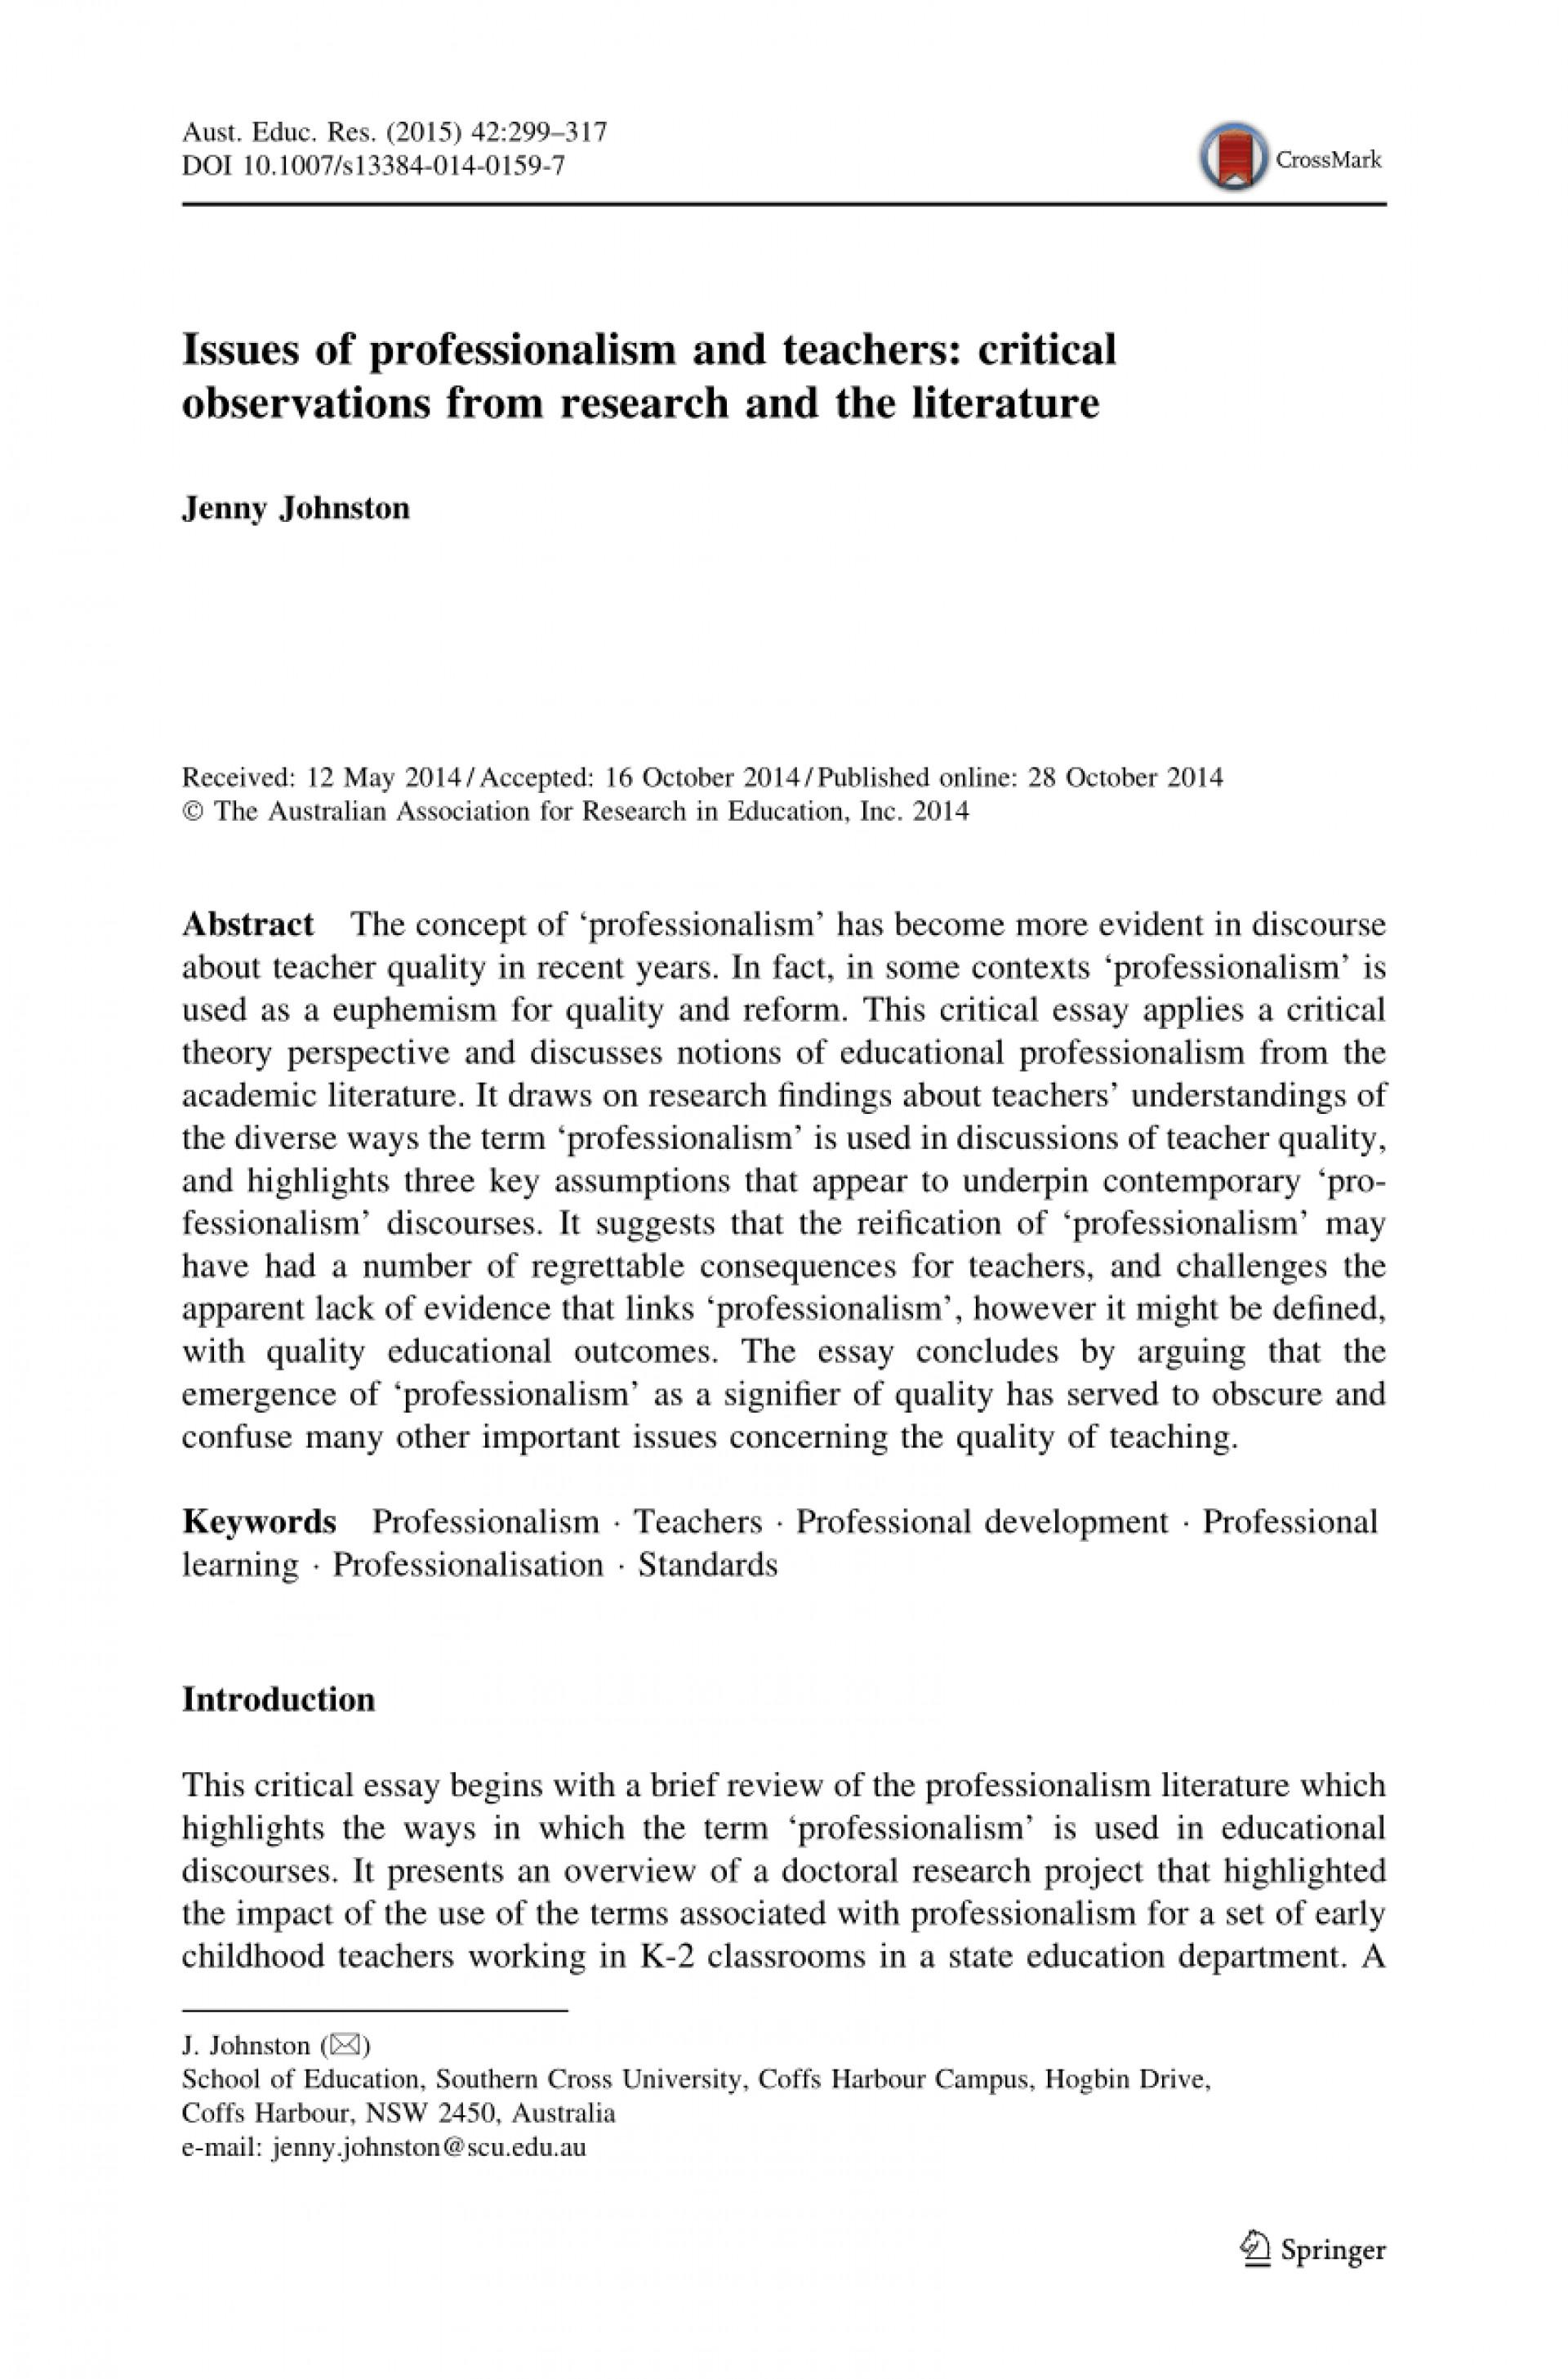 004 Essay Example Largepreview Sensational Professionalism Pdf Conclusion Teacher 1920